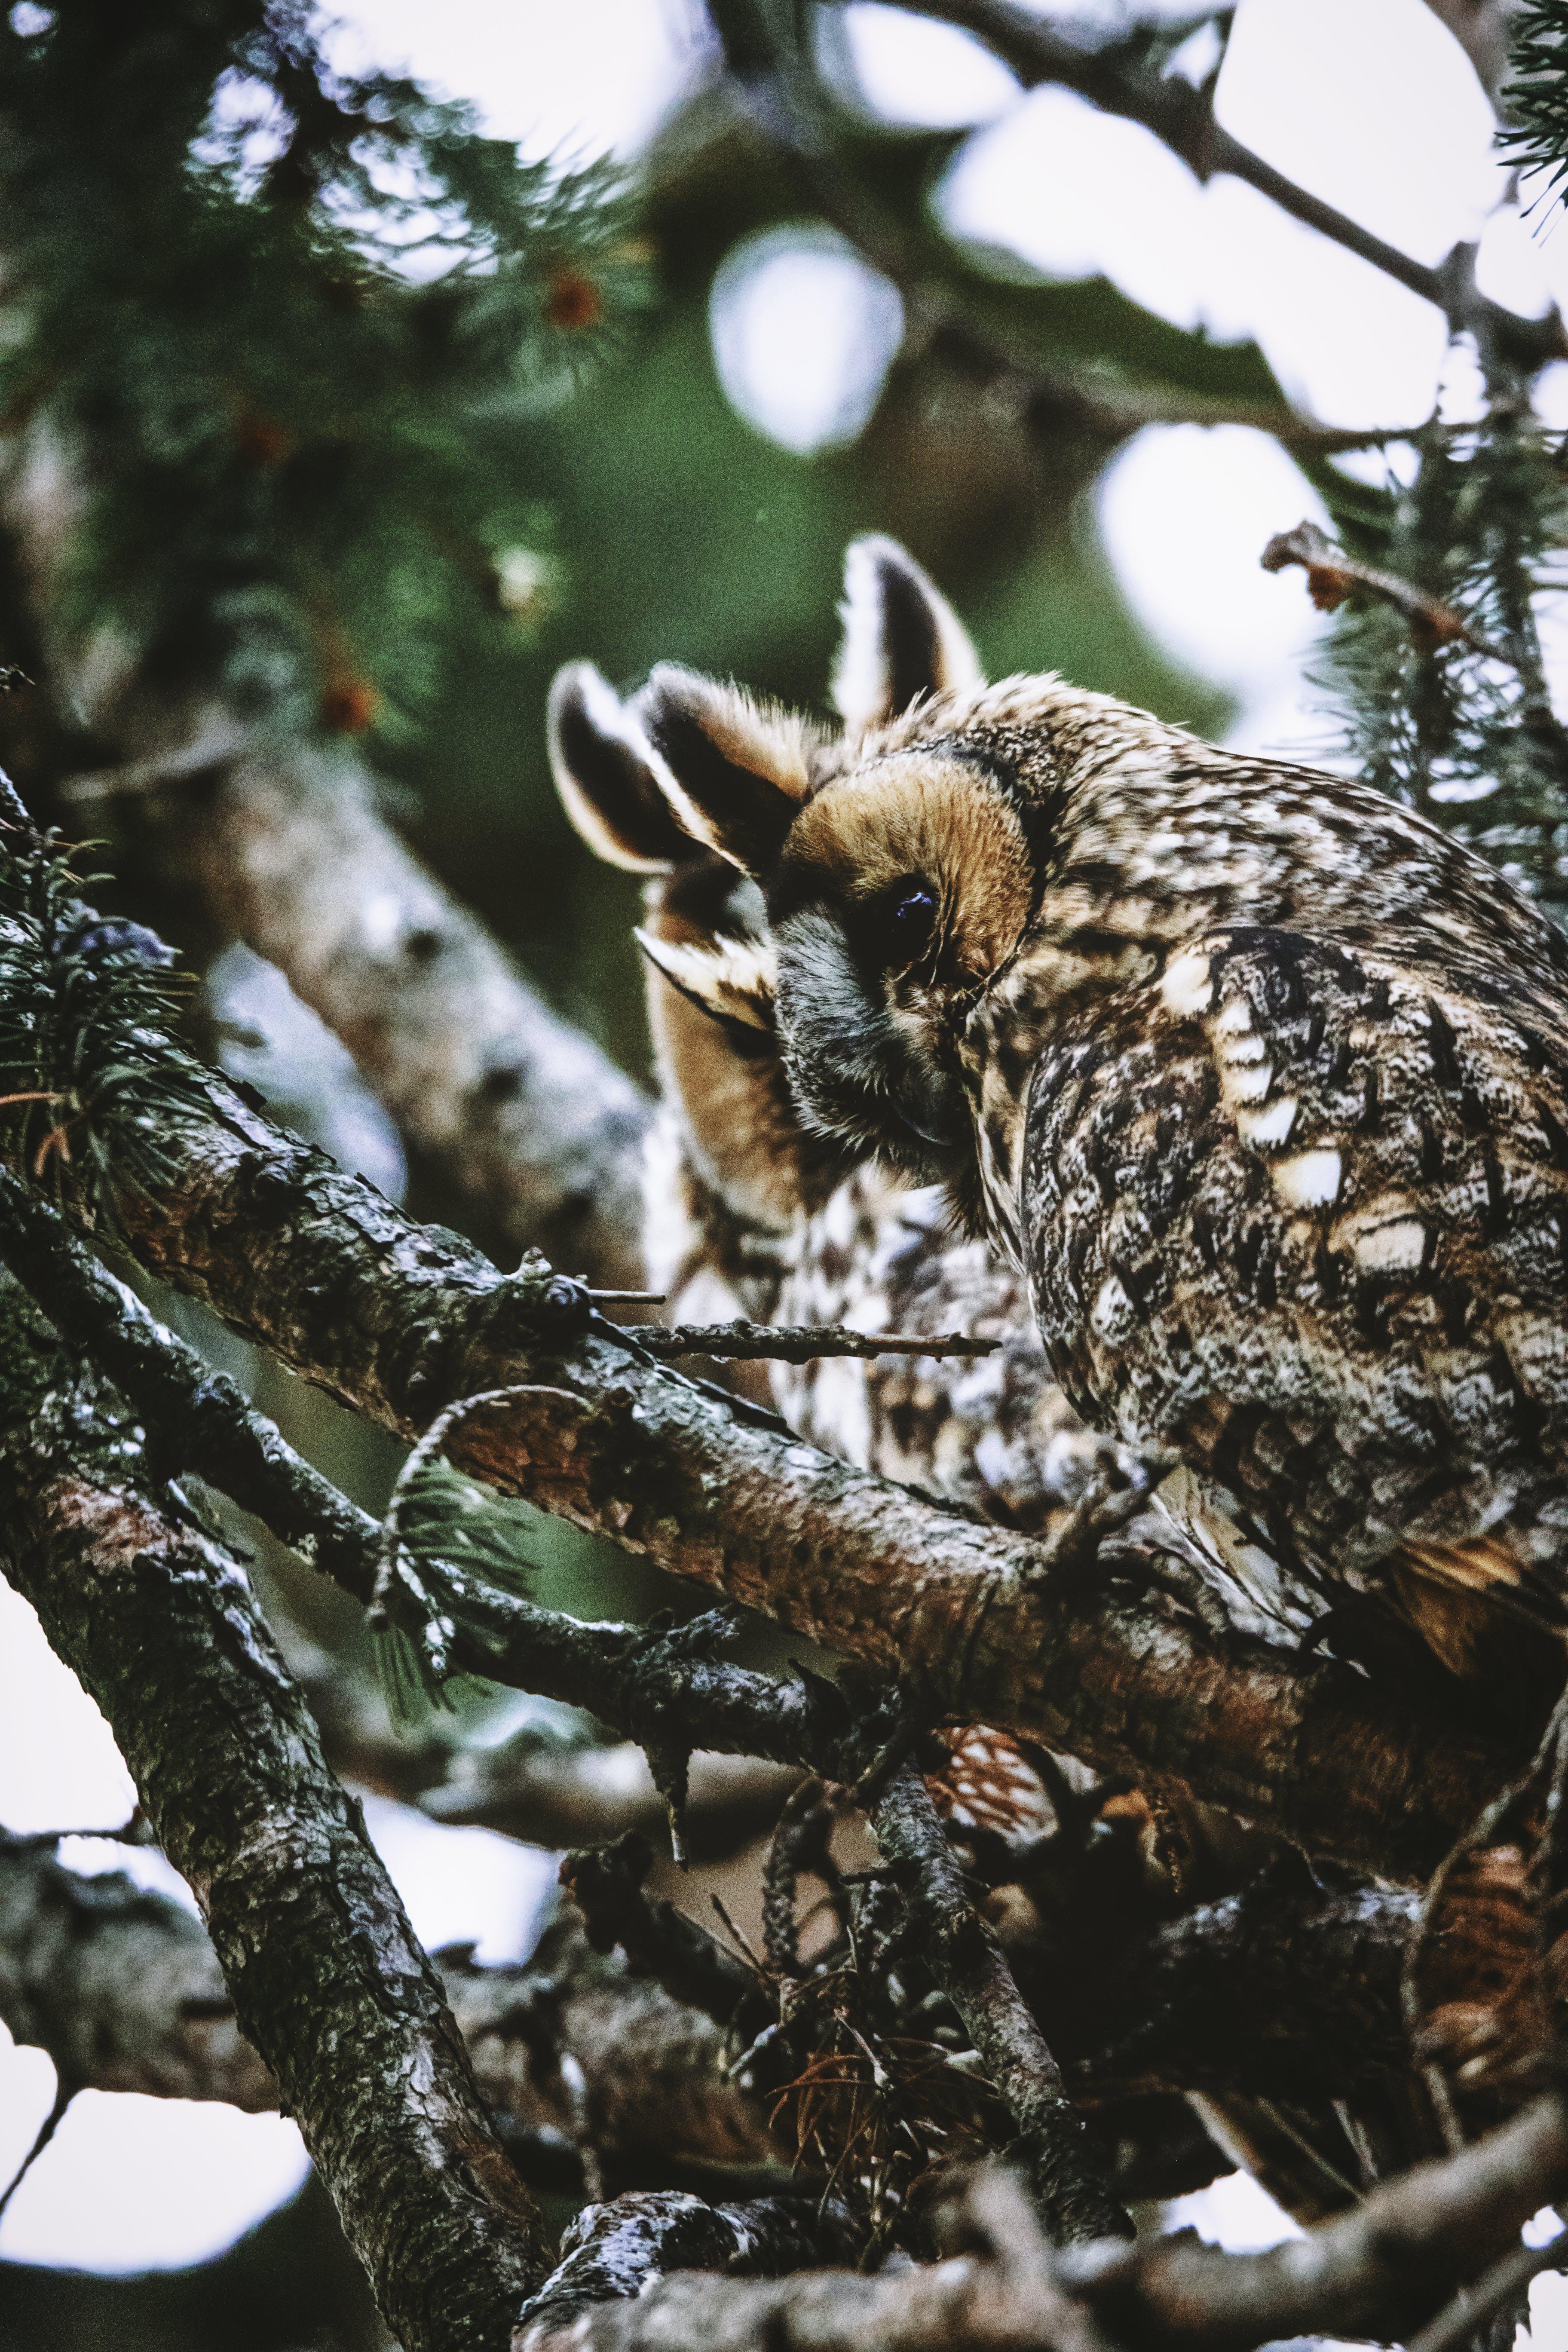 Fotos de stock gratuitas de animal, árbol, búho, fauna